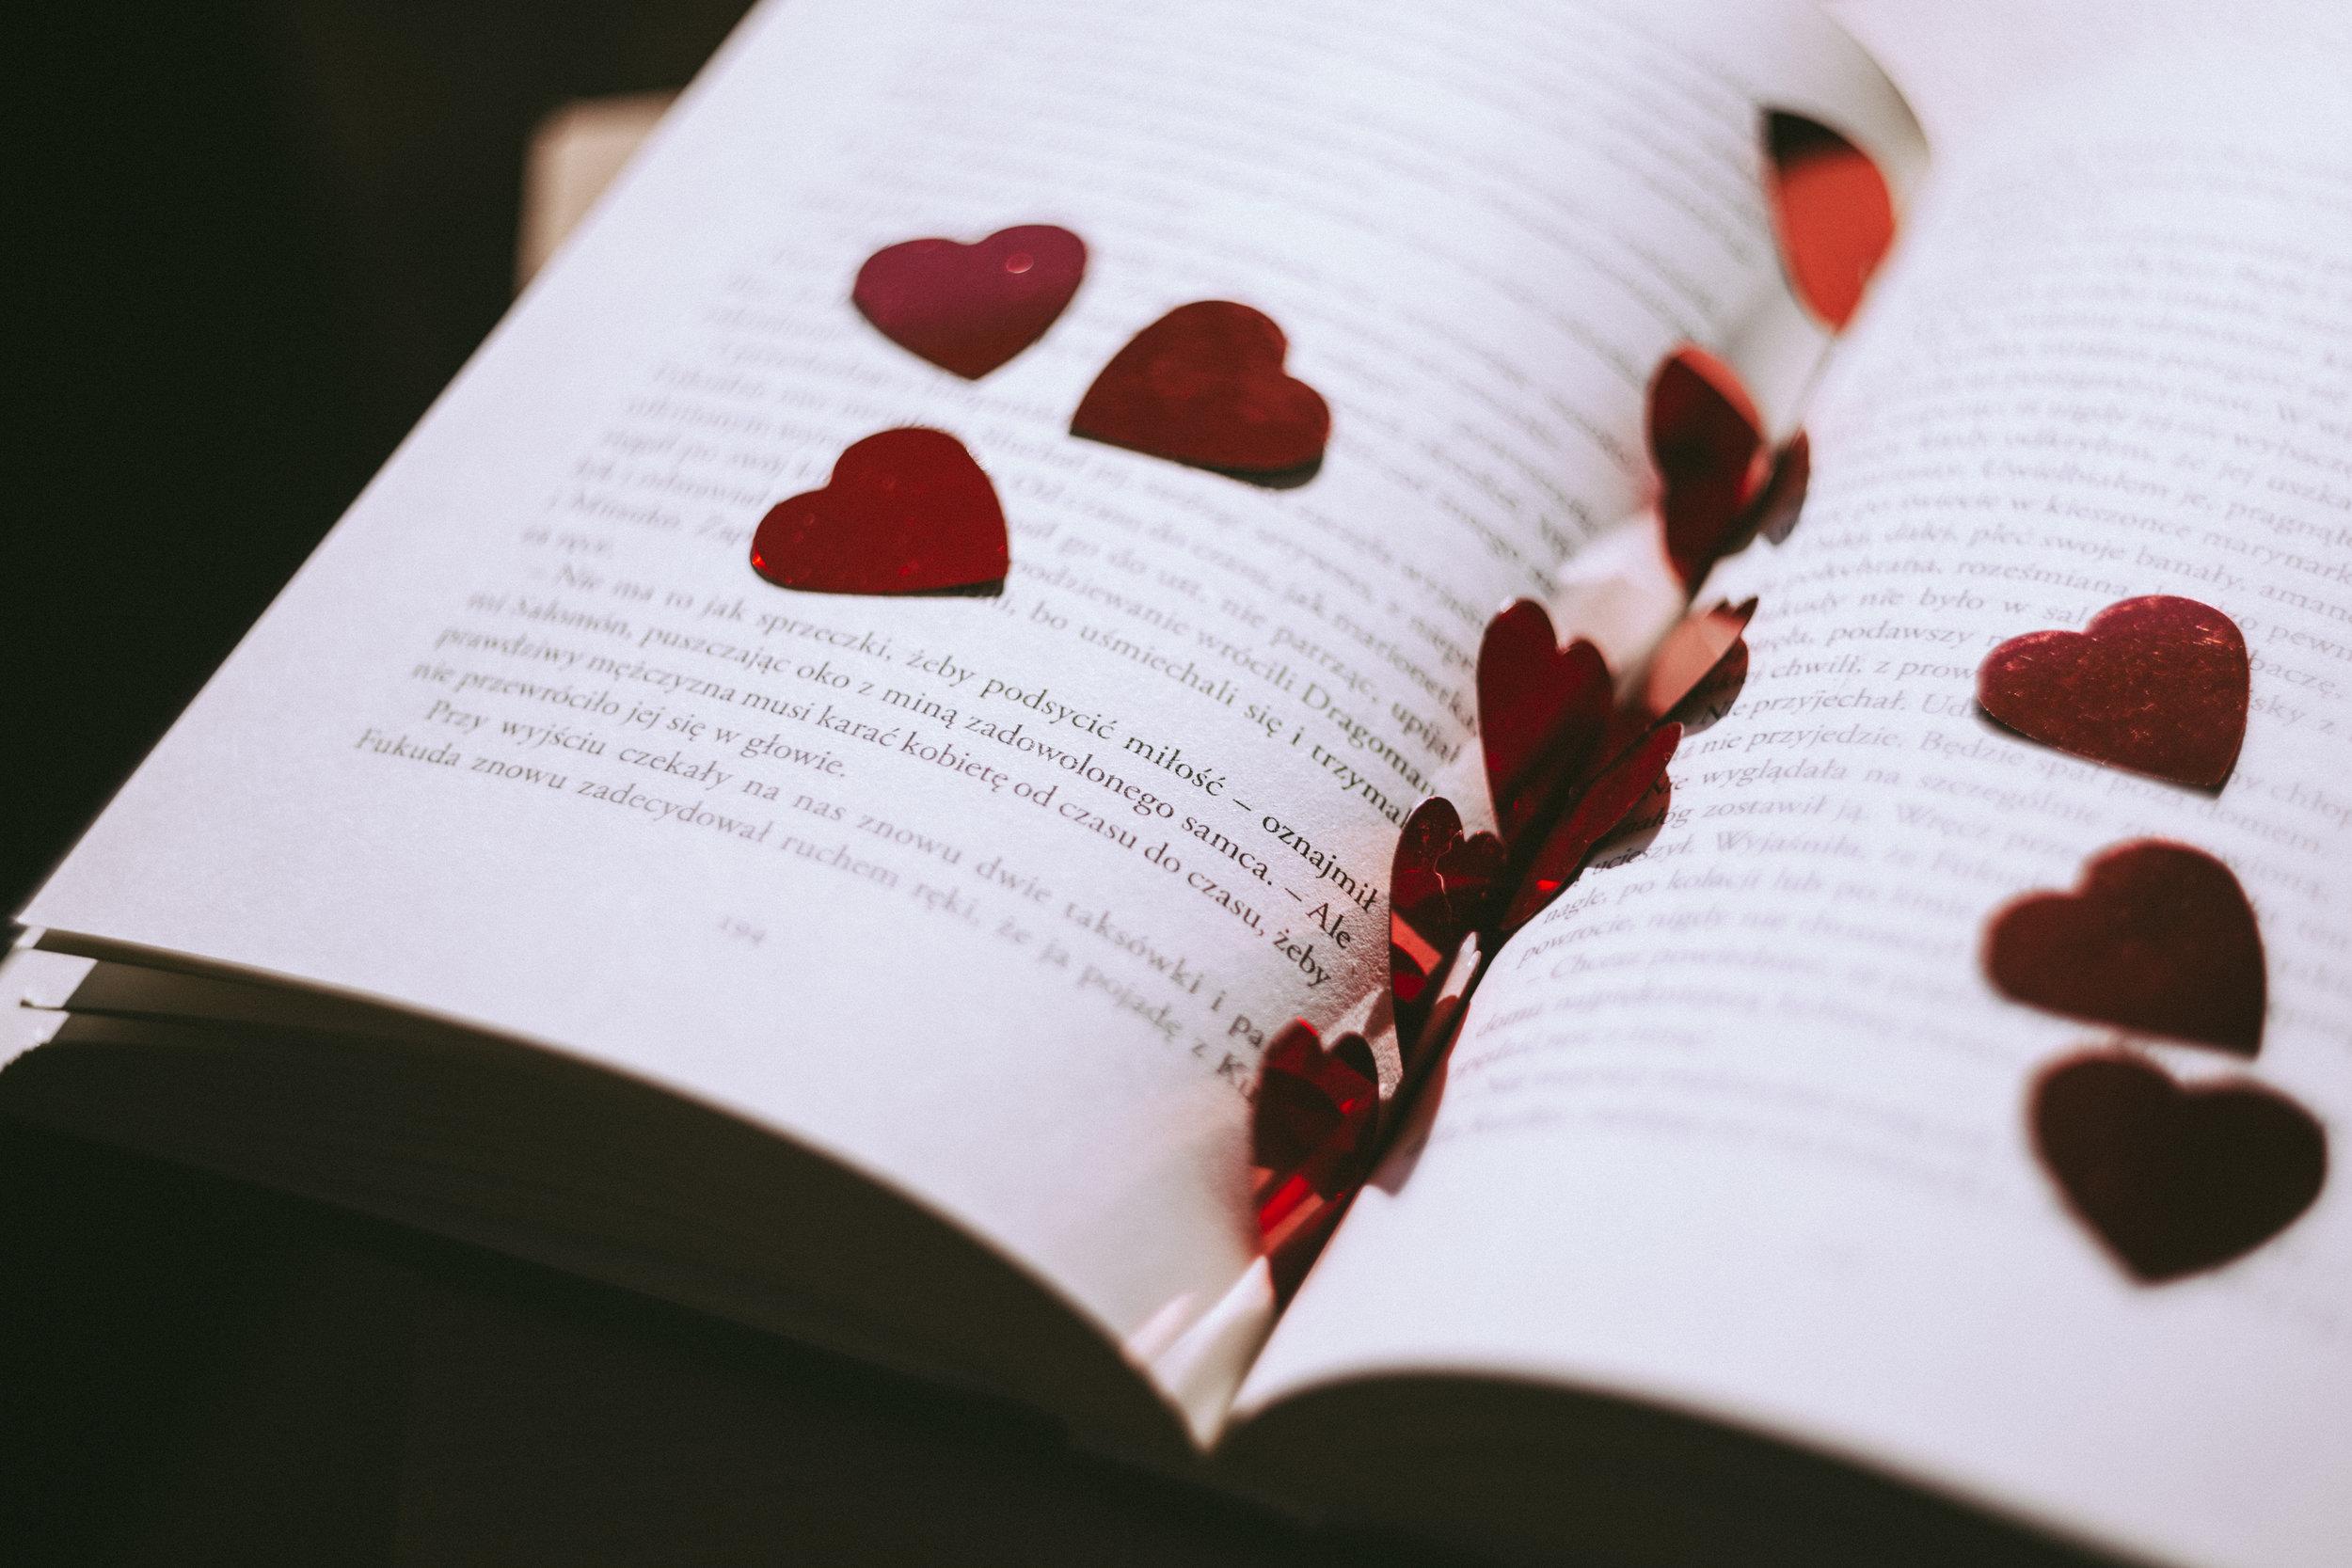 love, counseling, bryn mawr, therapy, villanova, love yourself